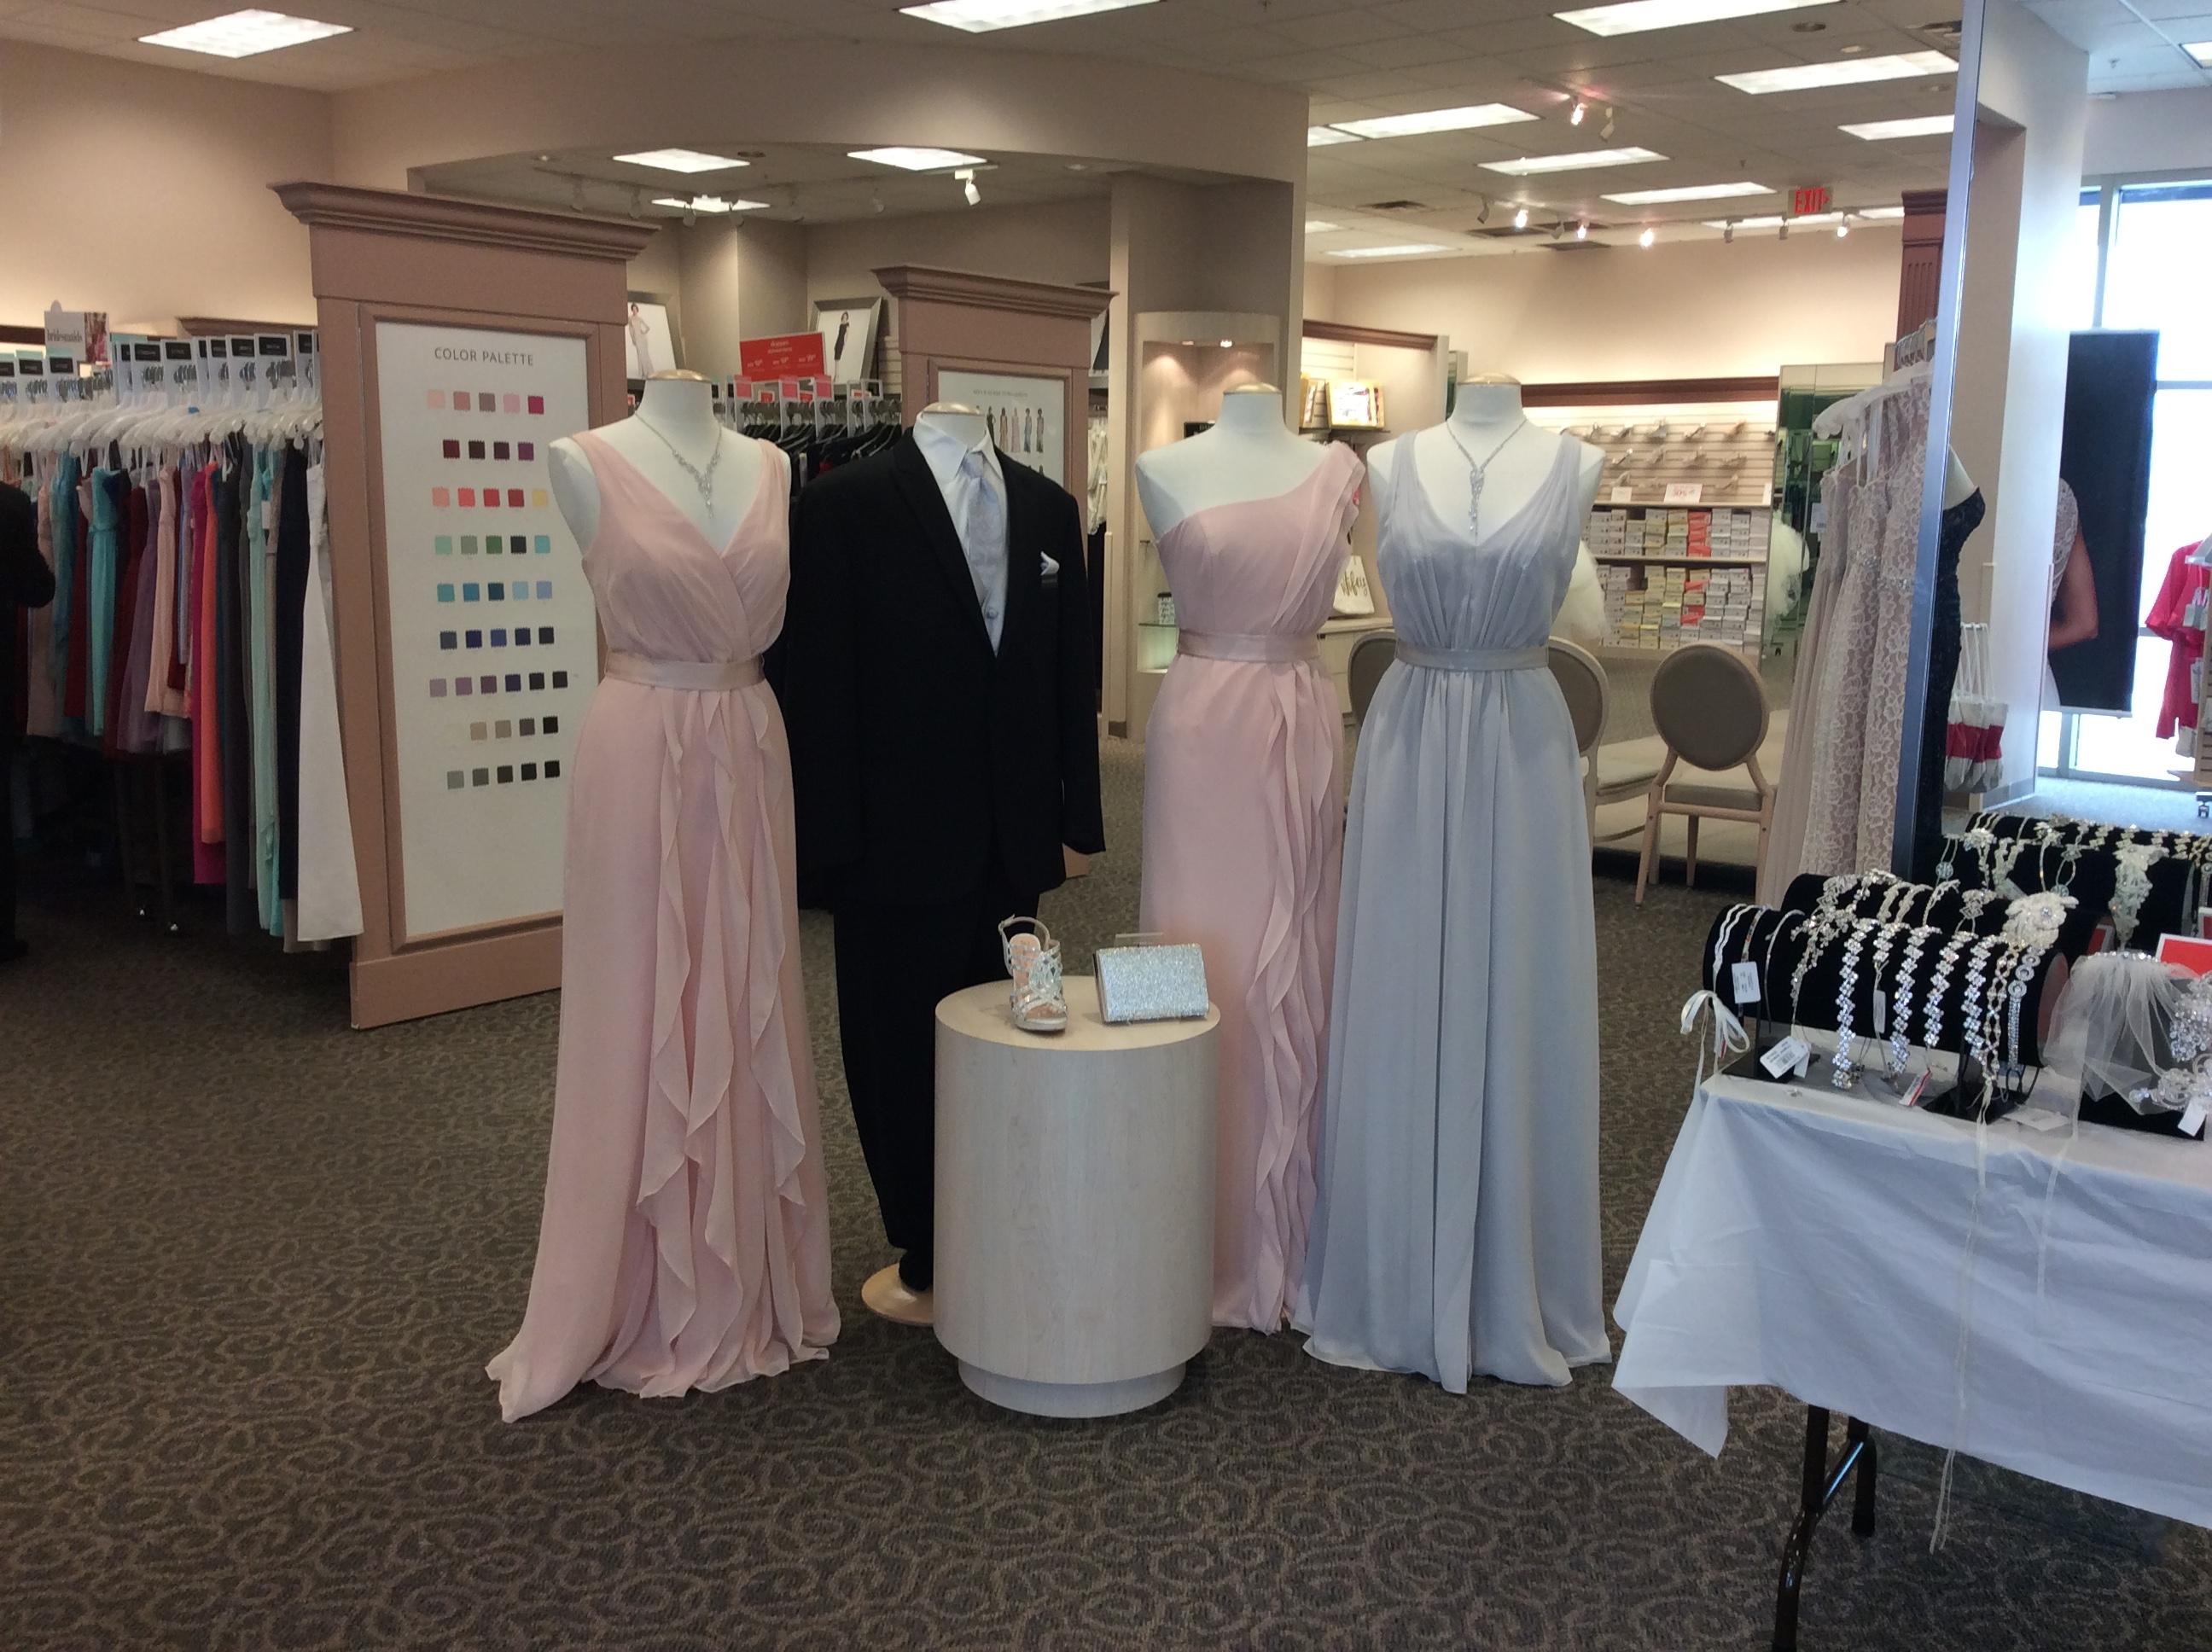 Tupelo, MS davids bridal | Find davids bridal in Tupelo, MS